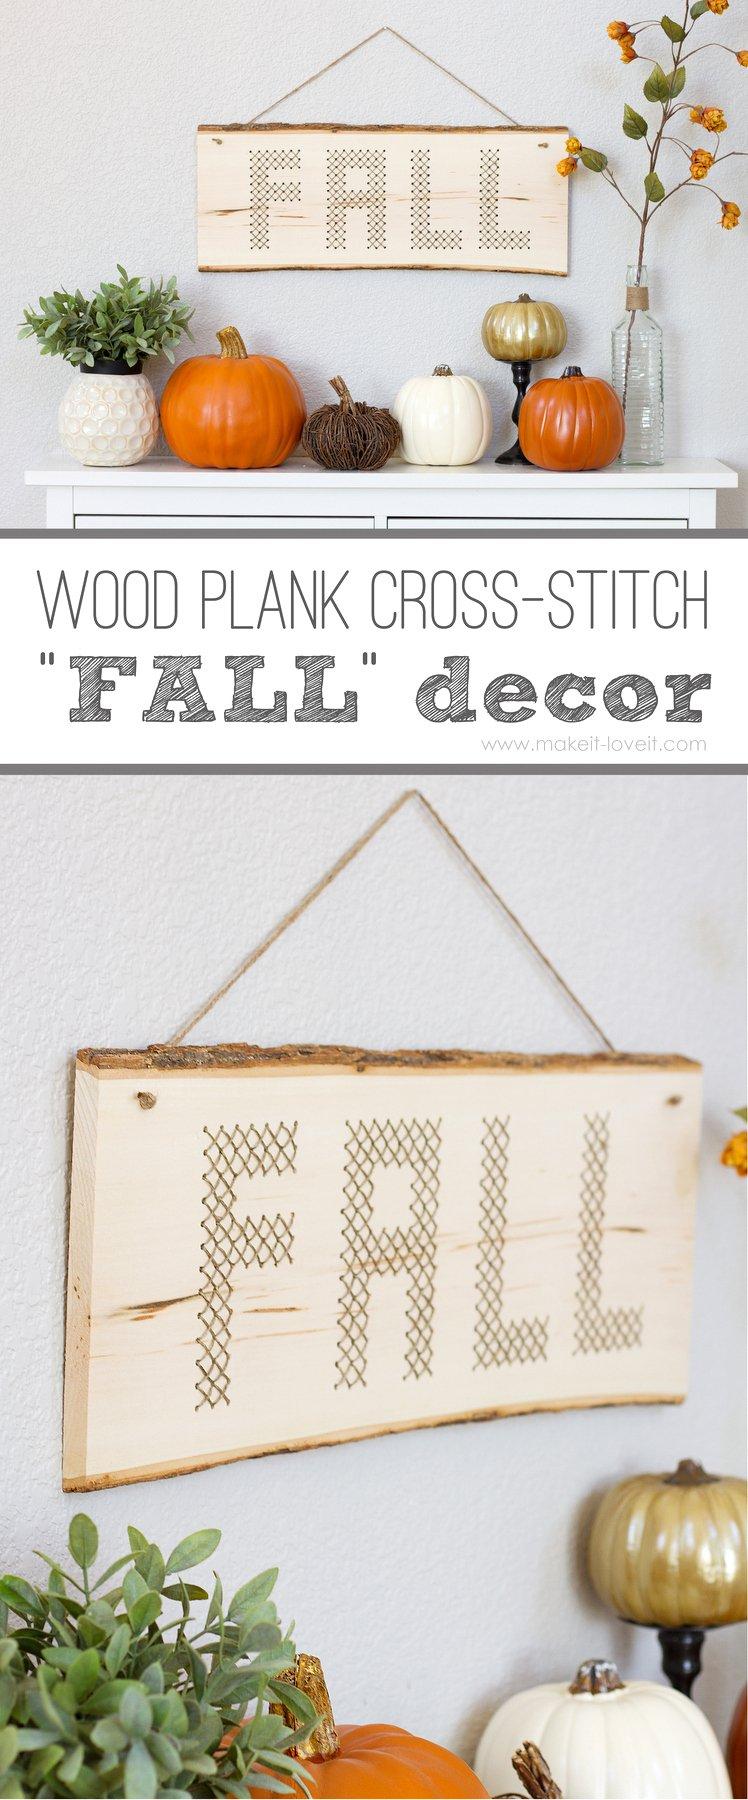 wood-plank-cross-stitch-fall-decor-7